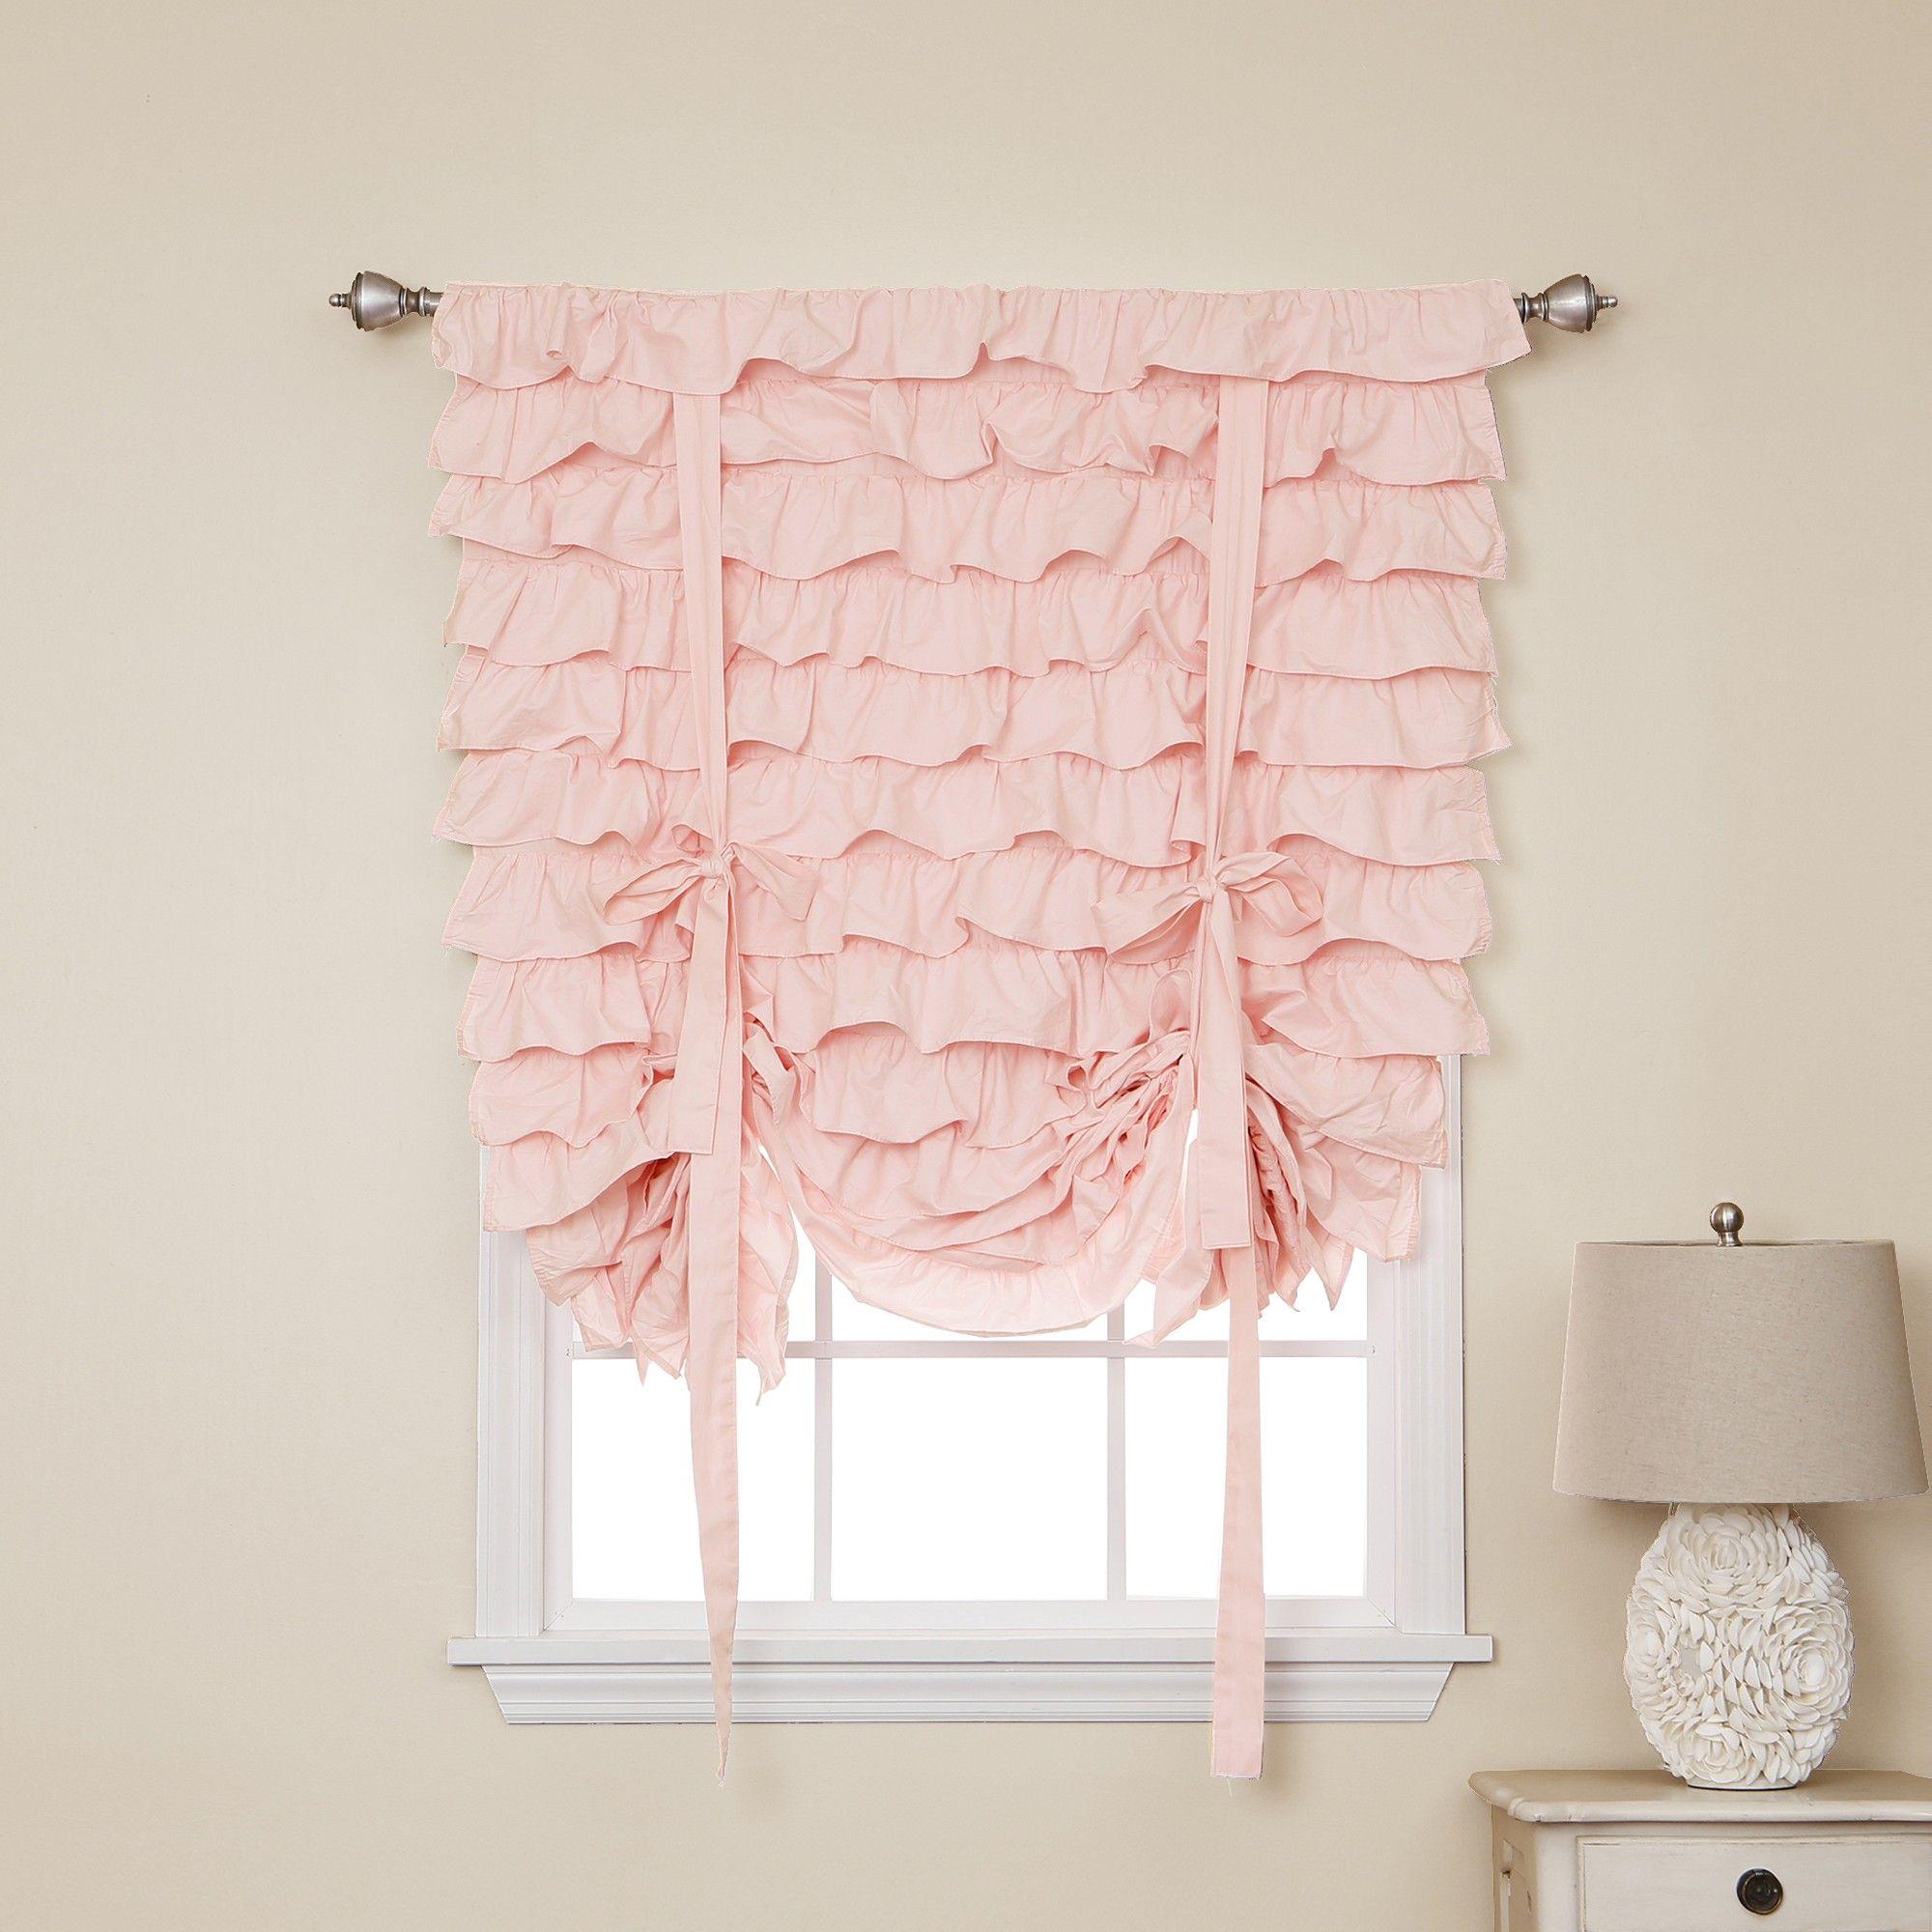 7 Homey Ruffle Curtains Blackout Ruffle Curtains Etsy Ruffled